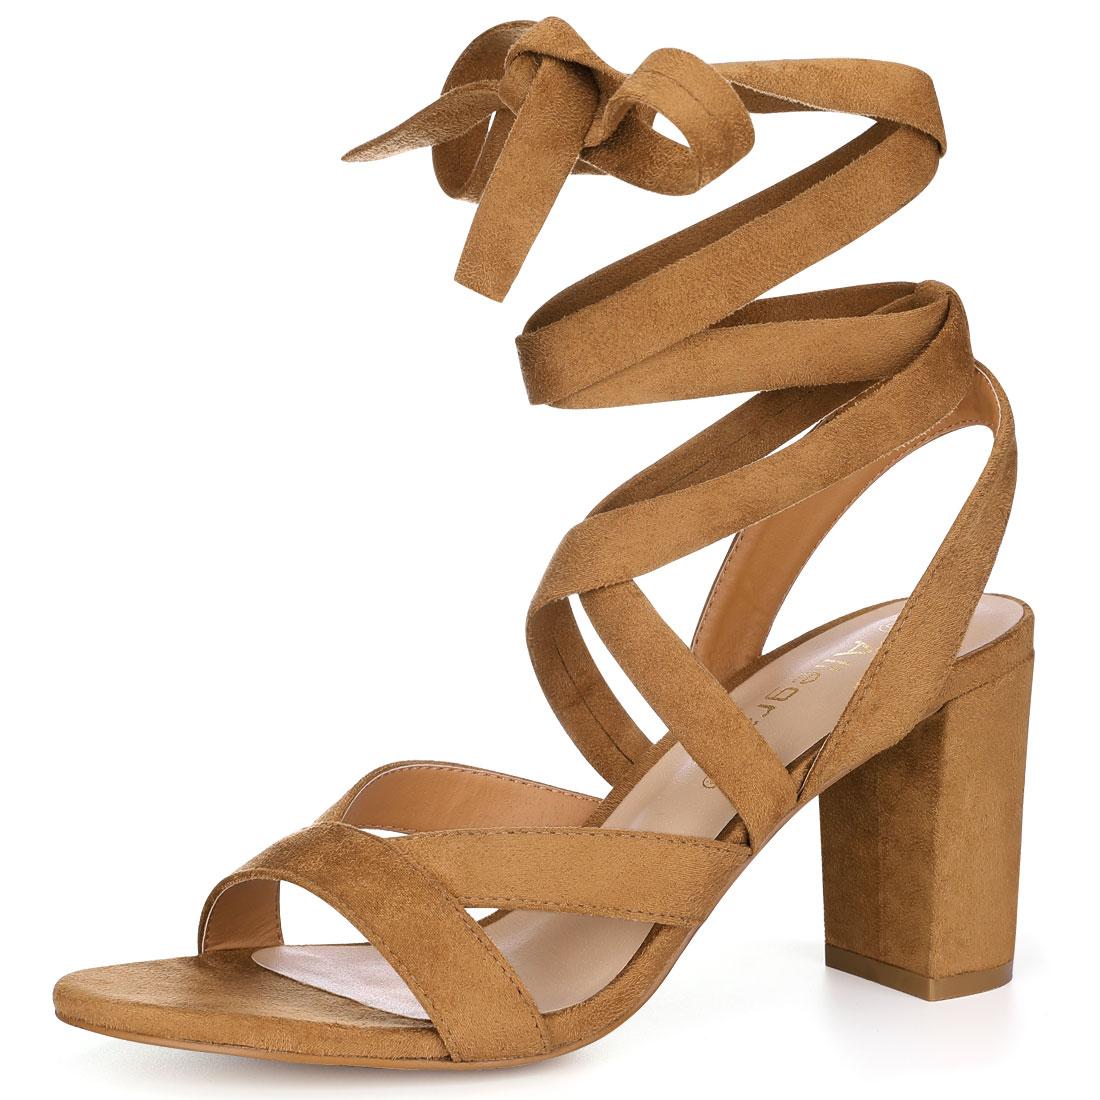 Allegra K Women Crisscross Lace Up Chunky Heel Sandals Brown US 7